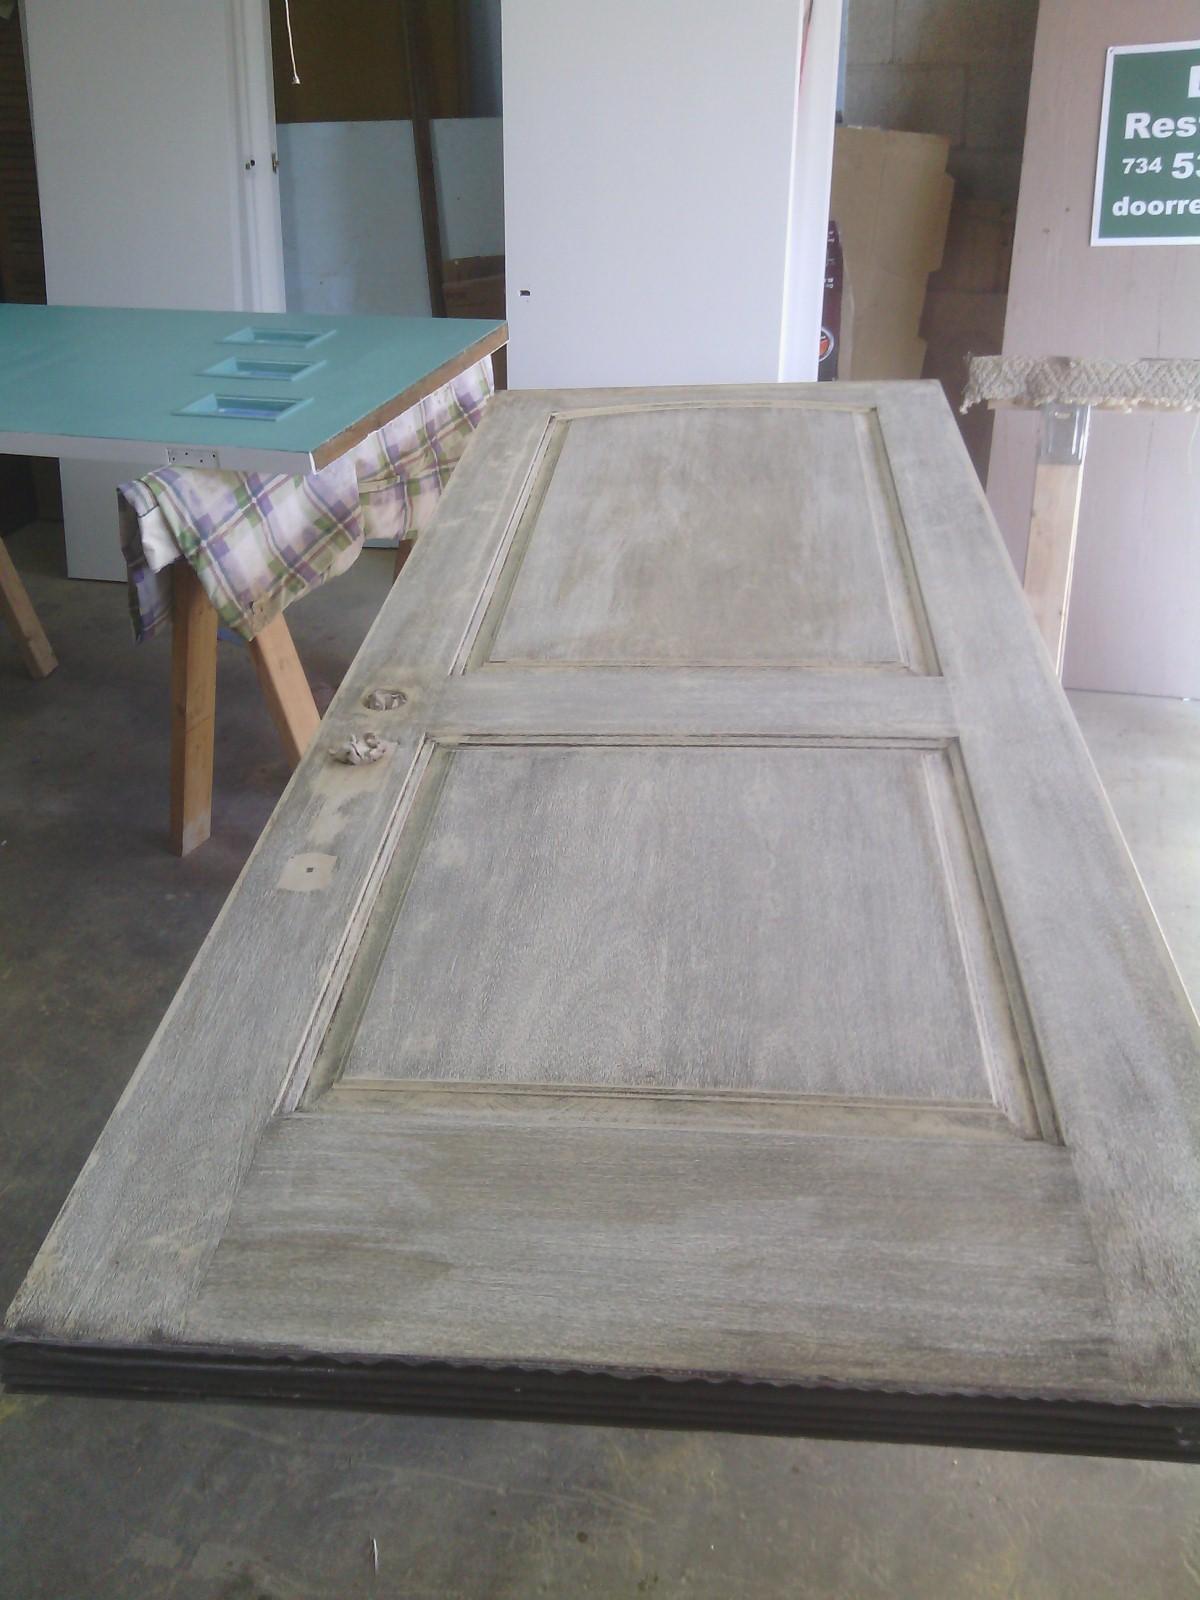 fiberglass-front-door-refinish-refinishing-restore-restoration-renew